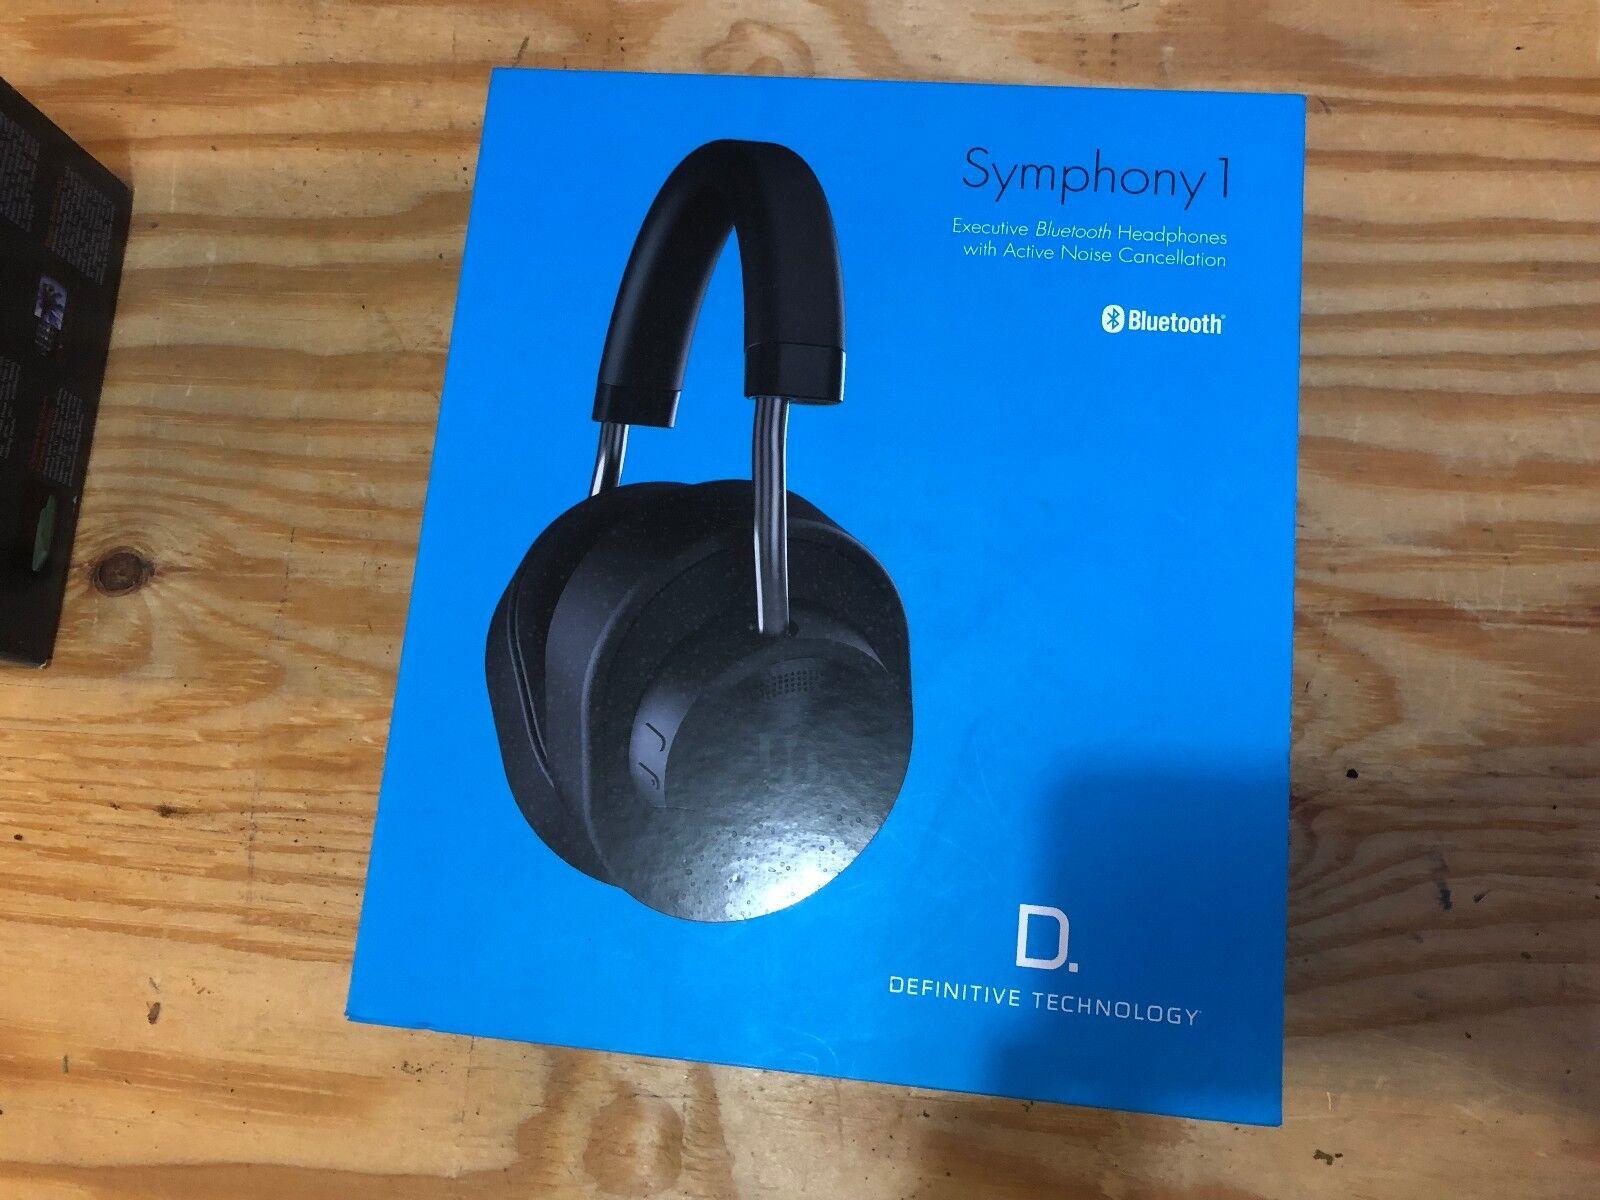 Definitive Technologies Executive blueetooth Headphones - Symphony 1, used once